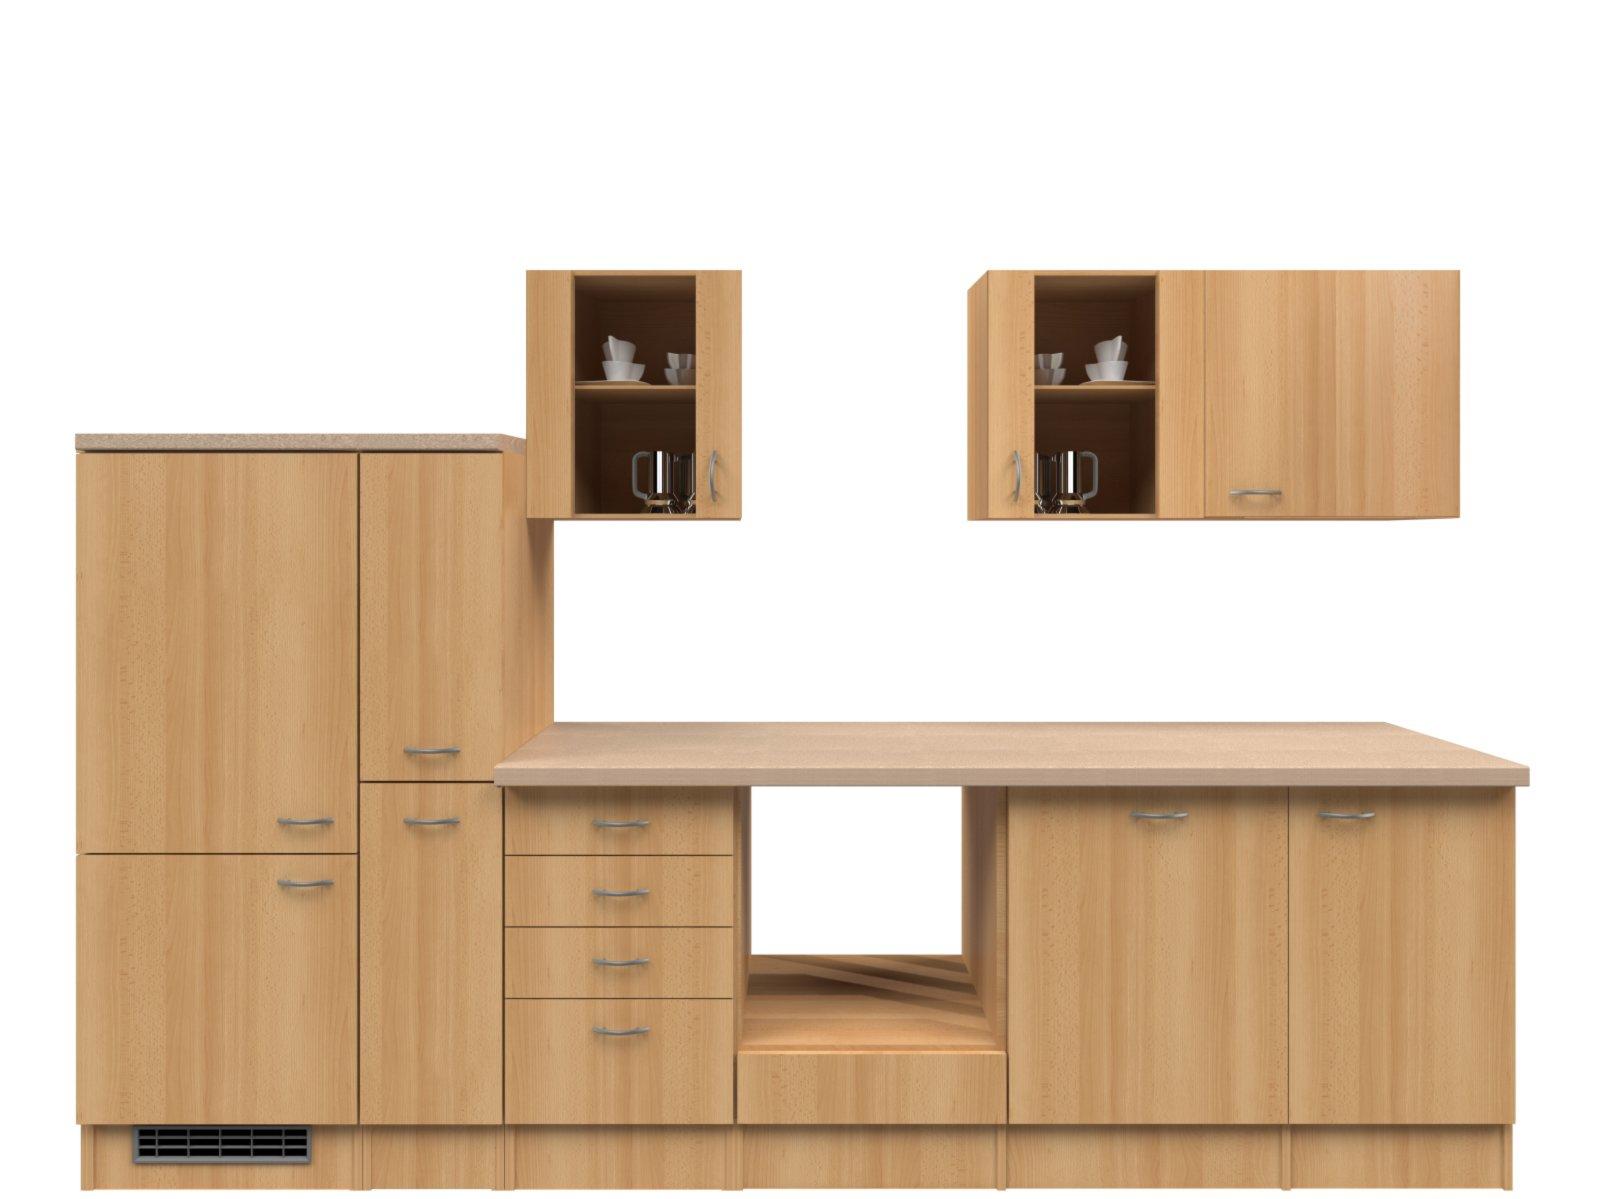 k chenblock nano buche 310 cm k chenzeilen ohne e ger te k chenzeilen m bel roller. Black Bedroom Furniture Sets. Home Design Ideas